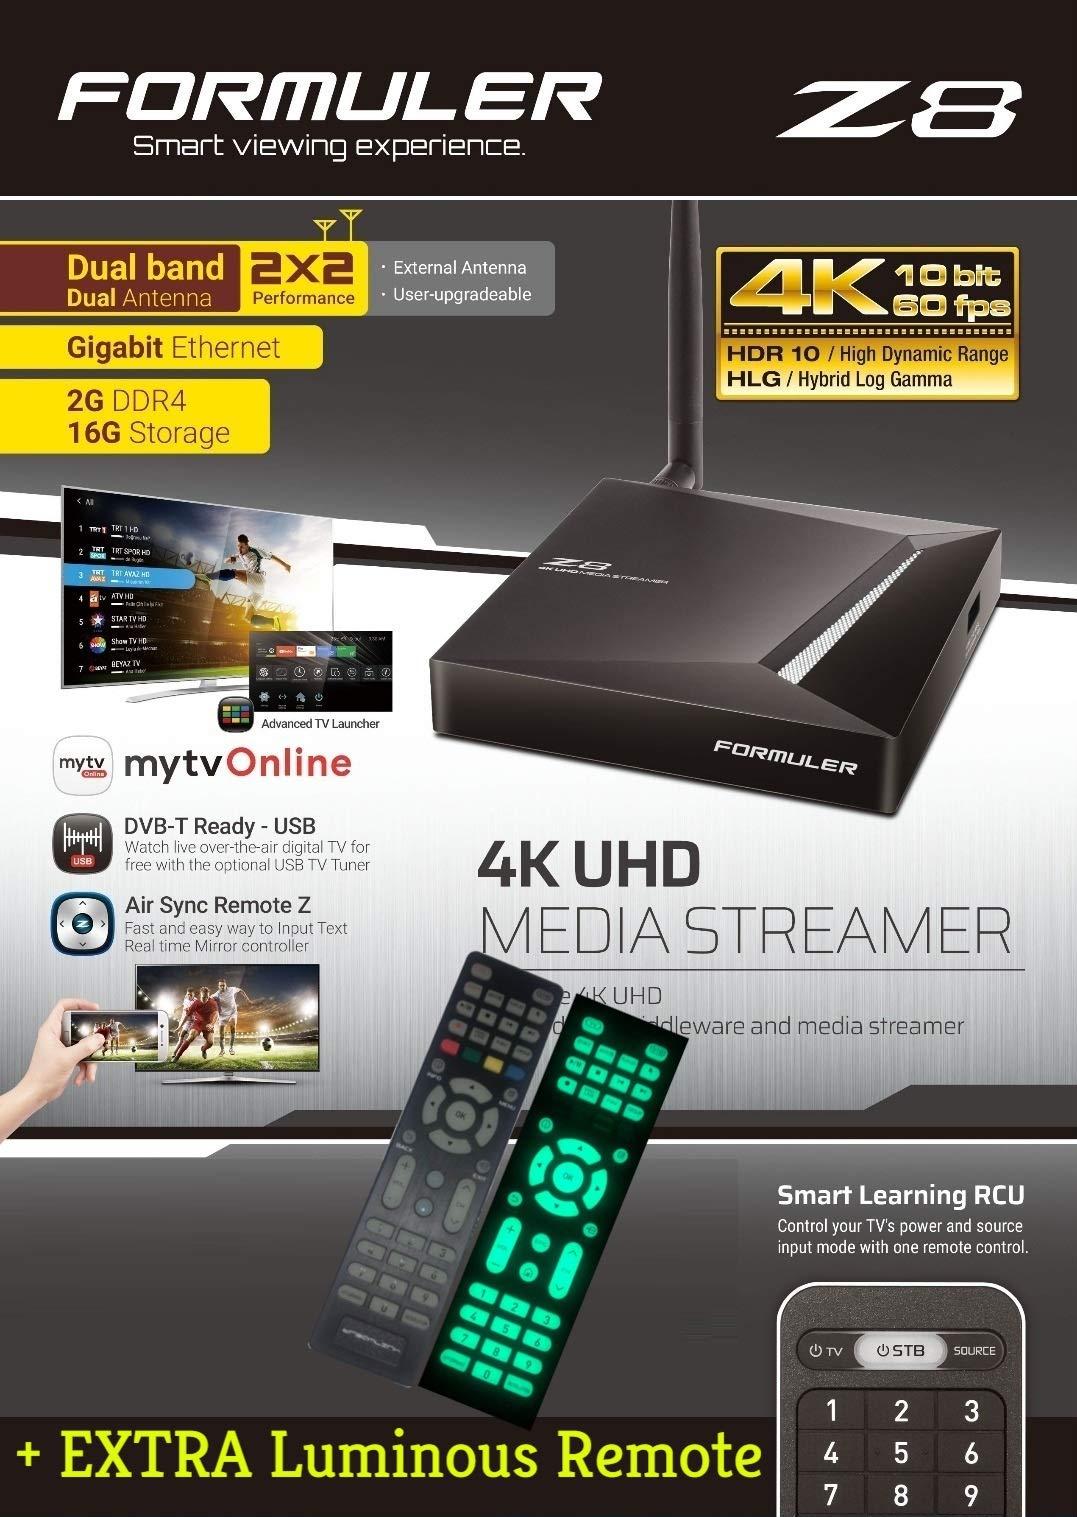 FORMULER Z8 Android Dual Band 5G Gigabit LAN 2GB RAM 16GB ROM 4K + Extra Luminous Remote + Free 3 in 1 Charger